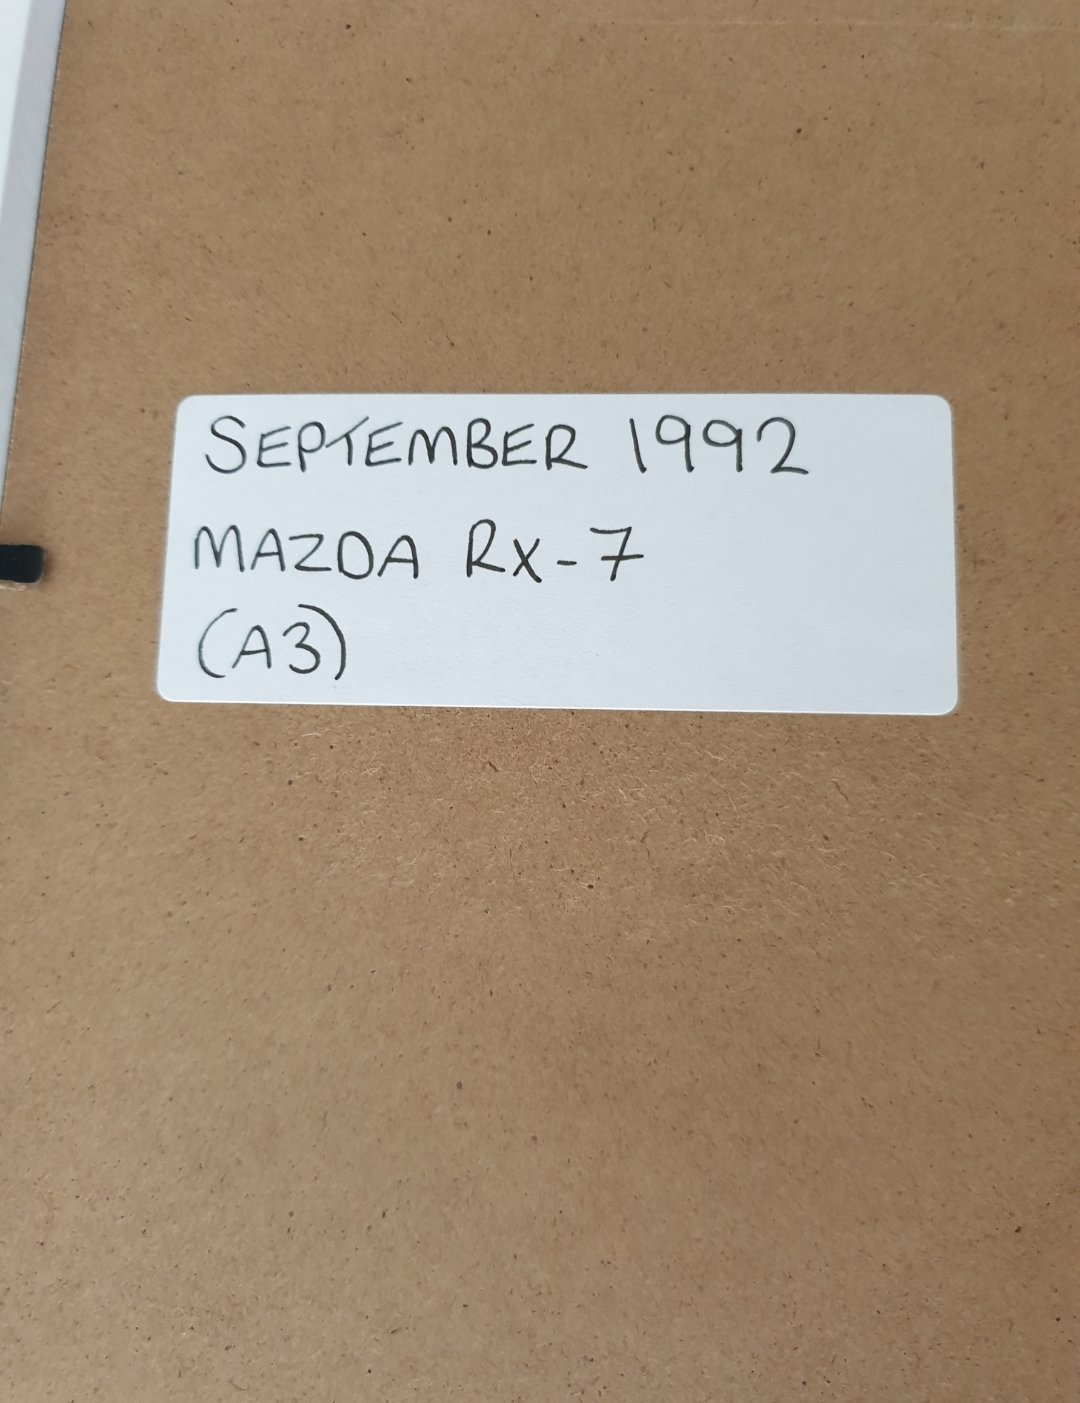 1992 Original Mazda RX-7 Framed Advert SOLD (picture 2 of 2)